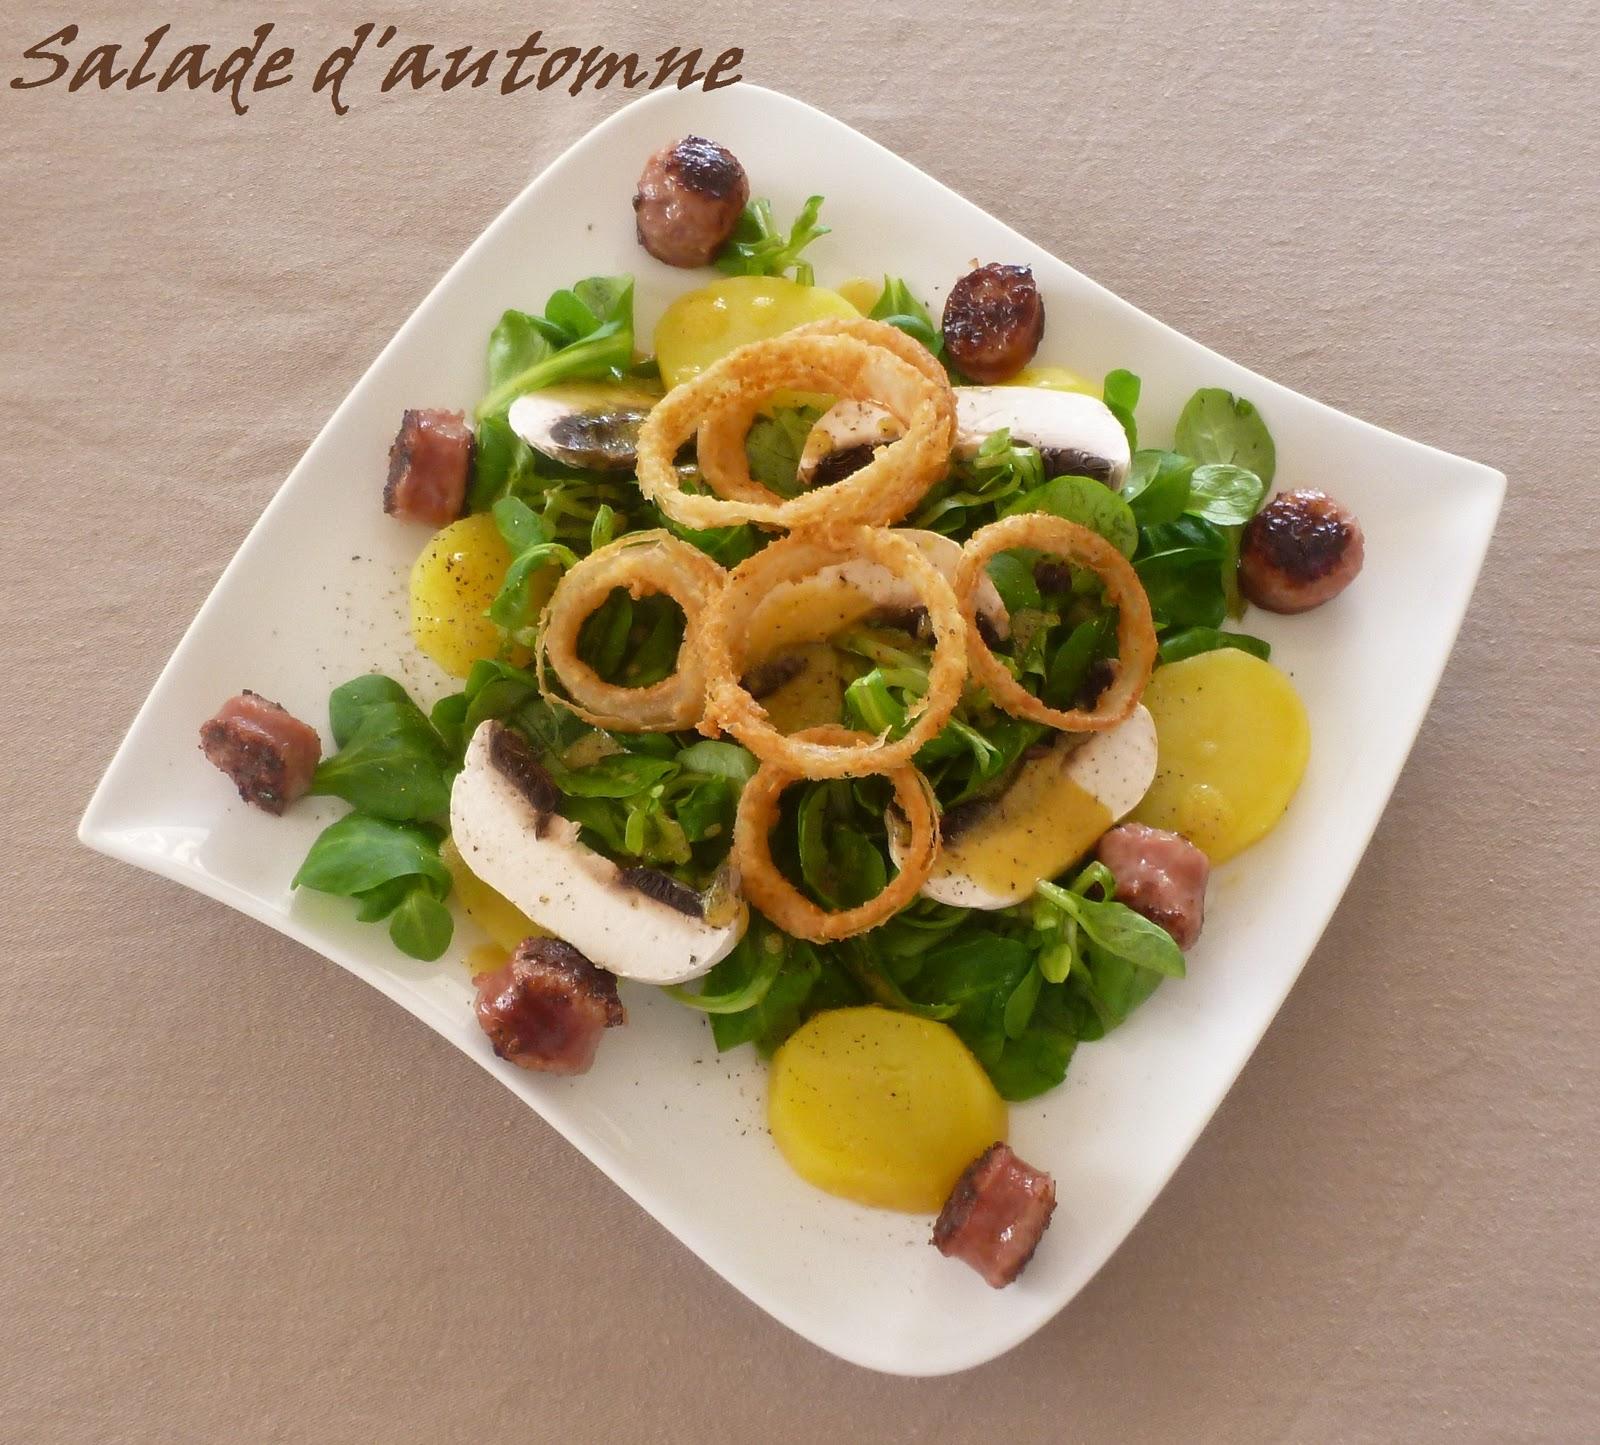 kriket 39 s cooking salade compos e pommes de terre saucisses oignons frits. Black Bedroom Furniture Sets. Home Design Ideas